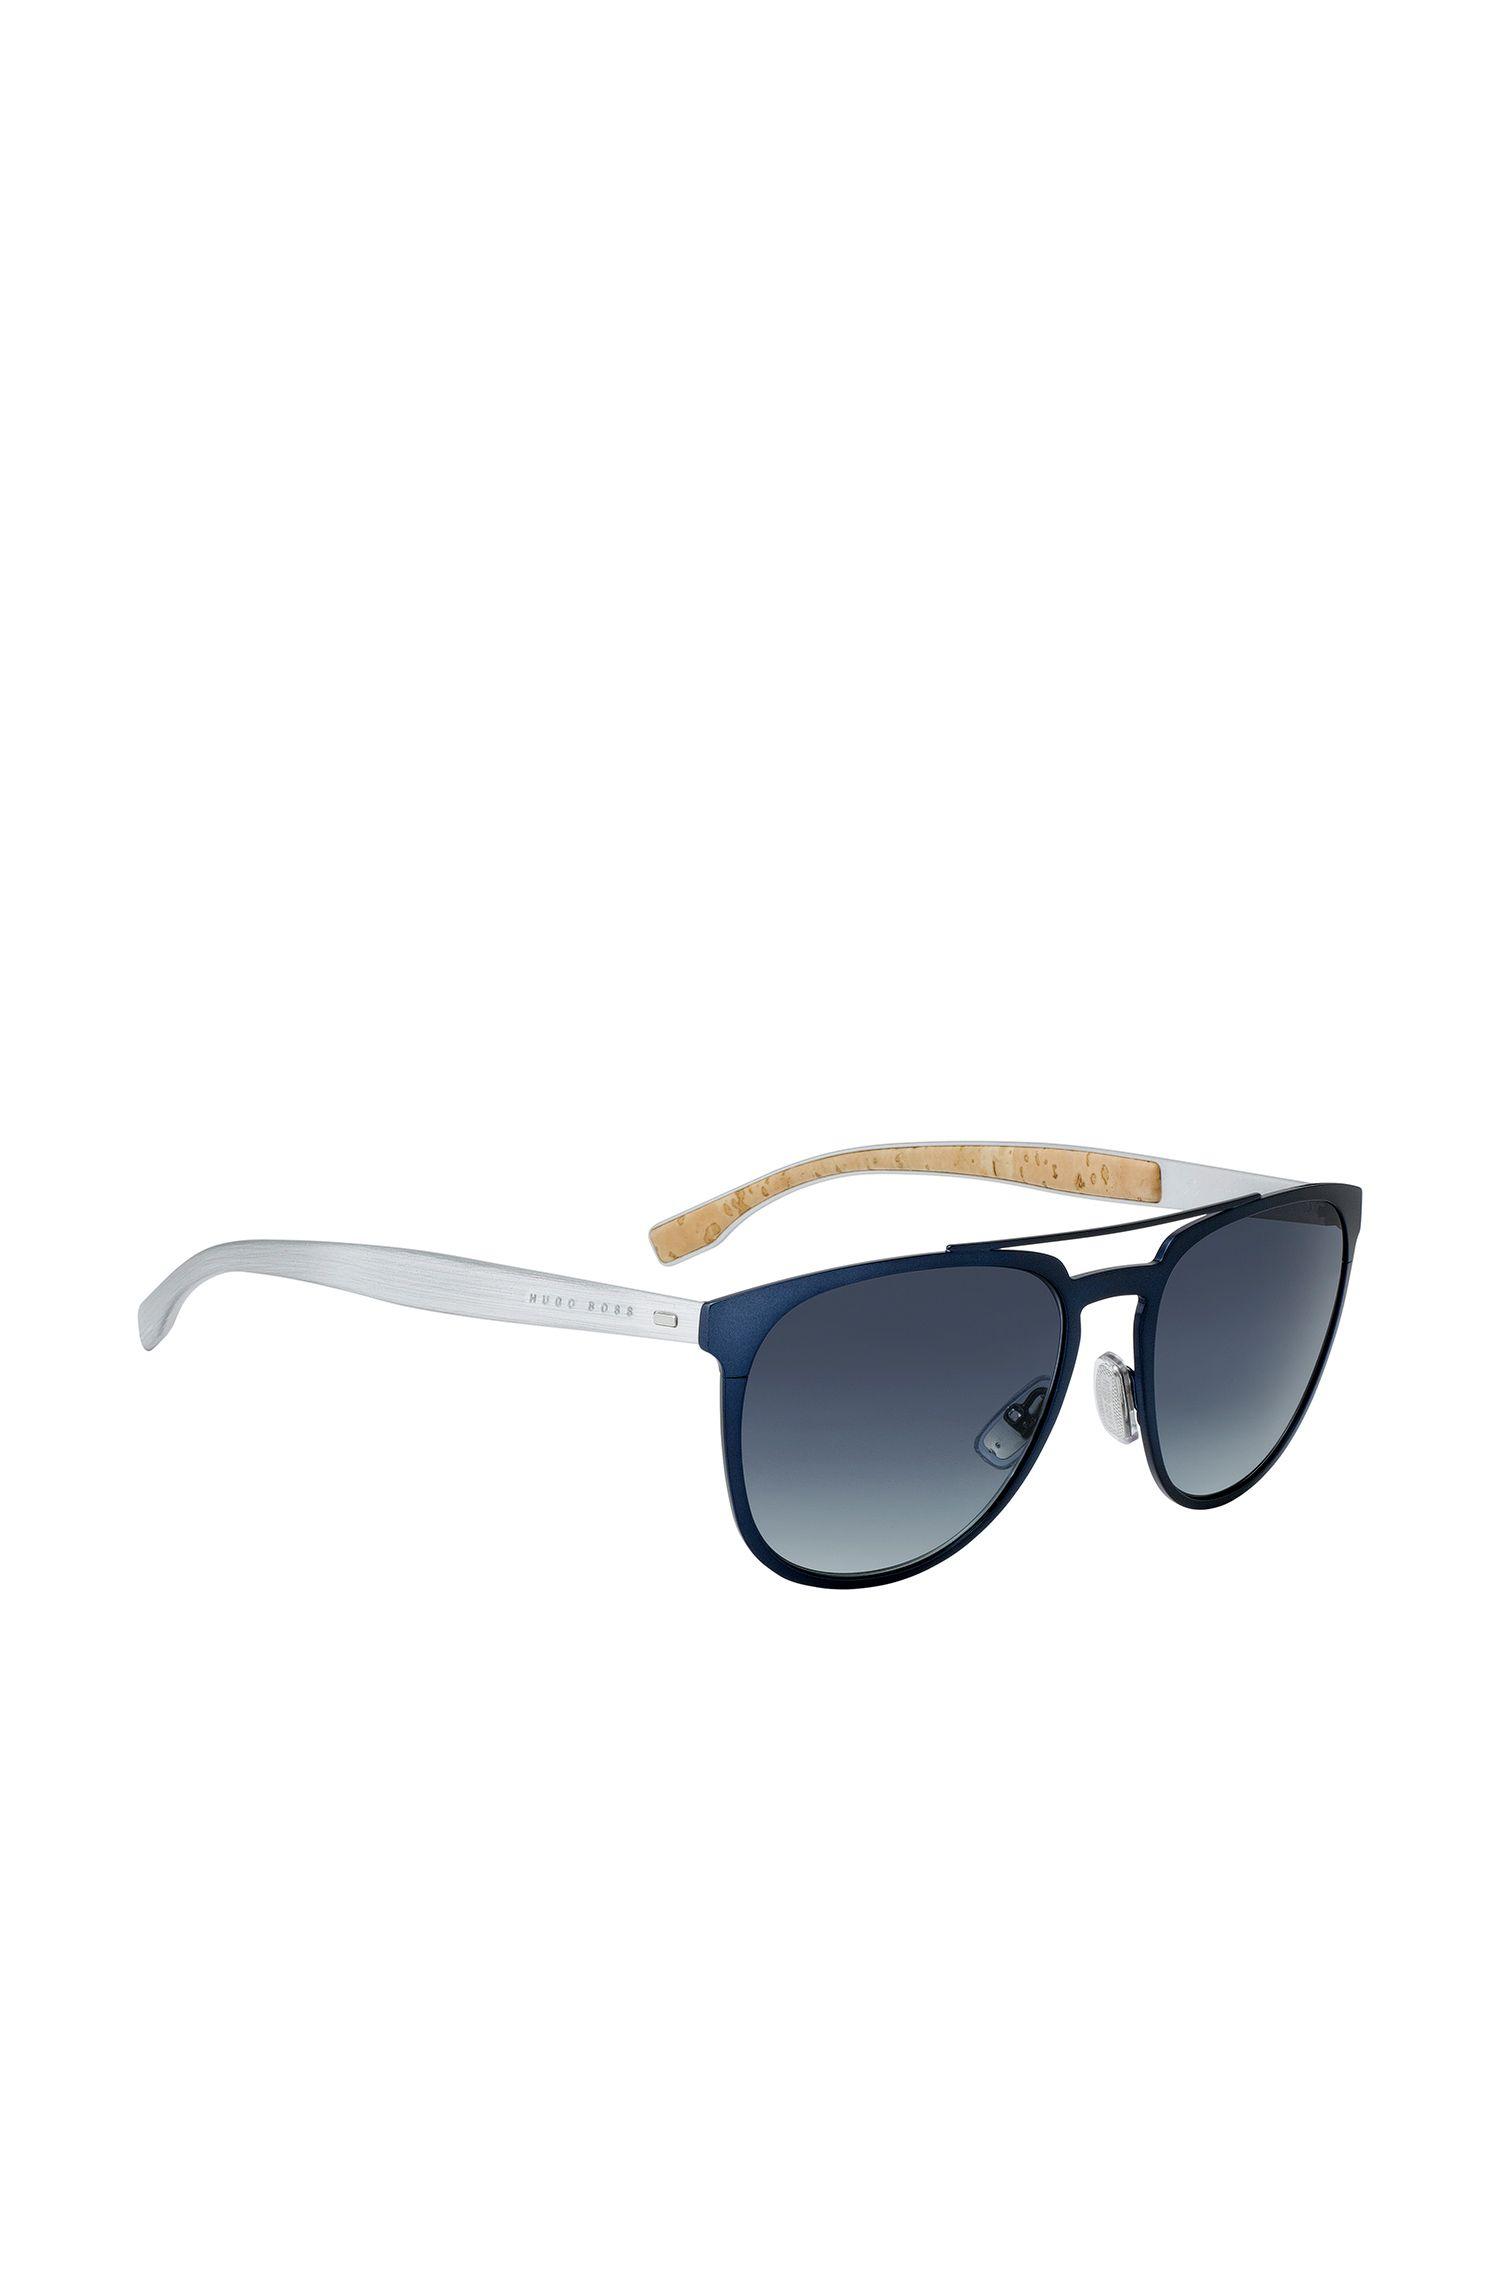 Aviator sunglasses with thin blue metallic frames